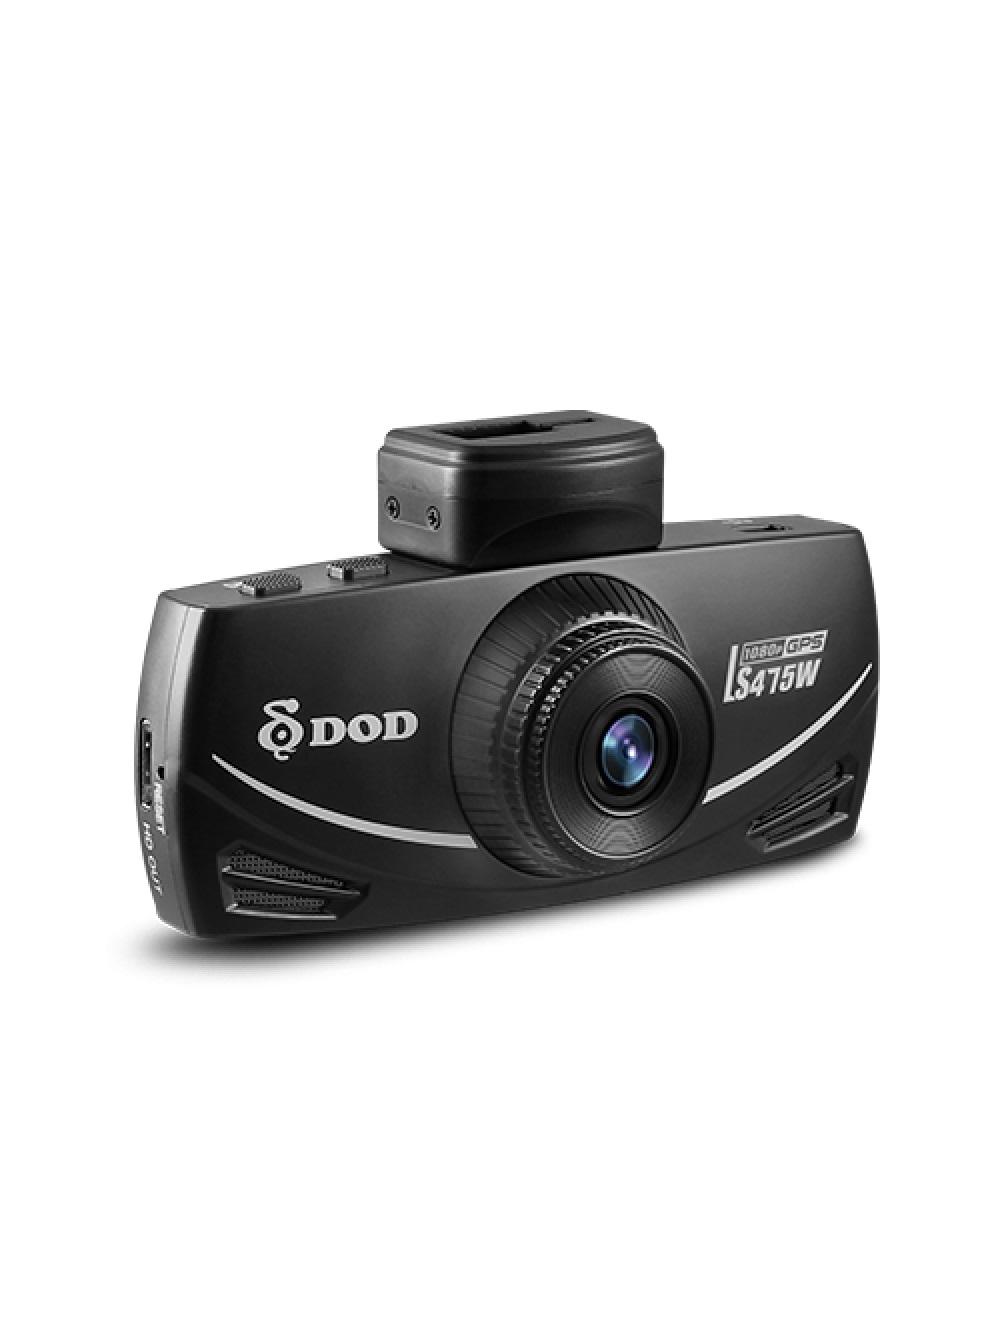 Видеорегистратор DOD LS475W, черный видеорегистратор 9500